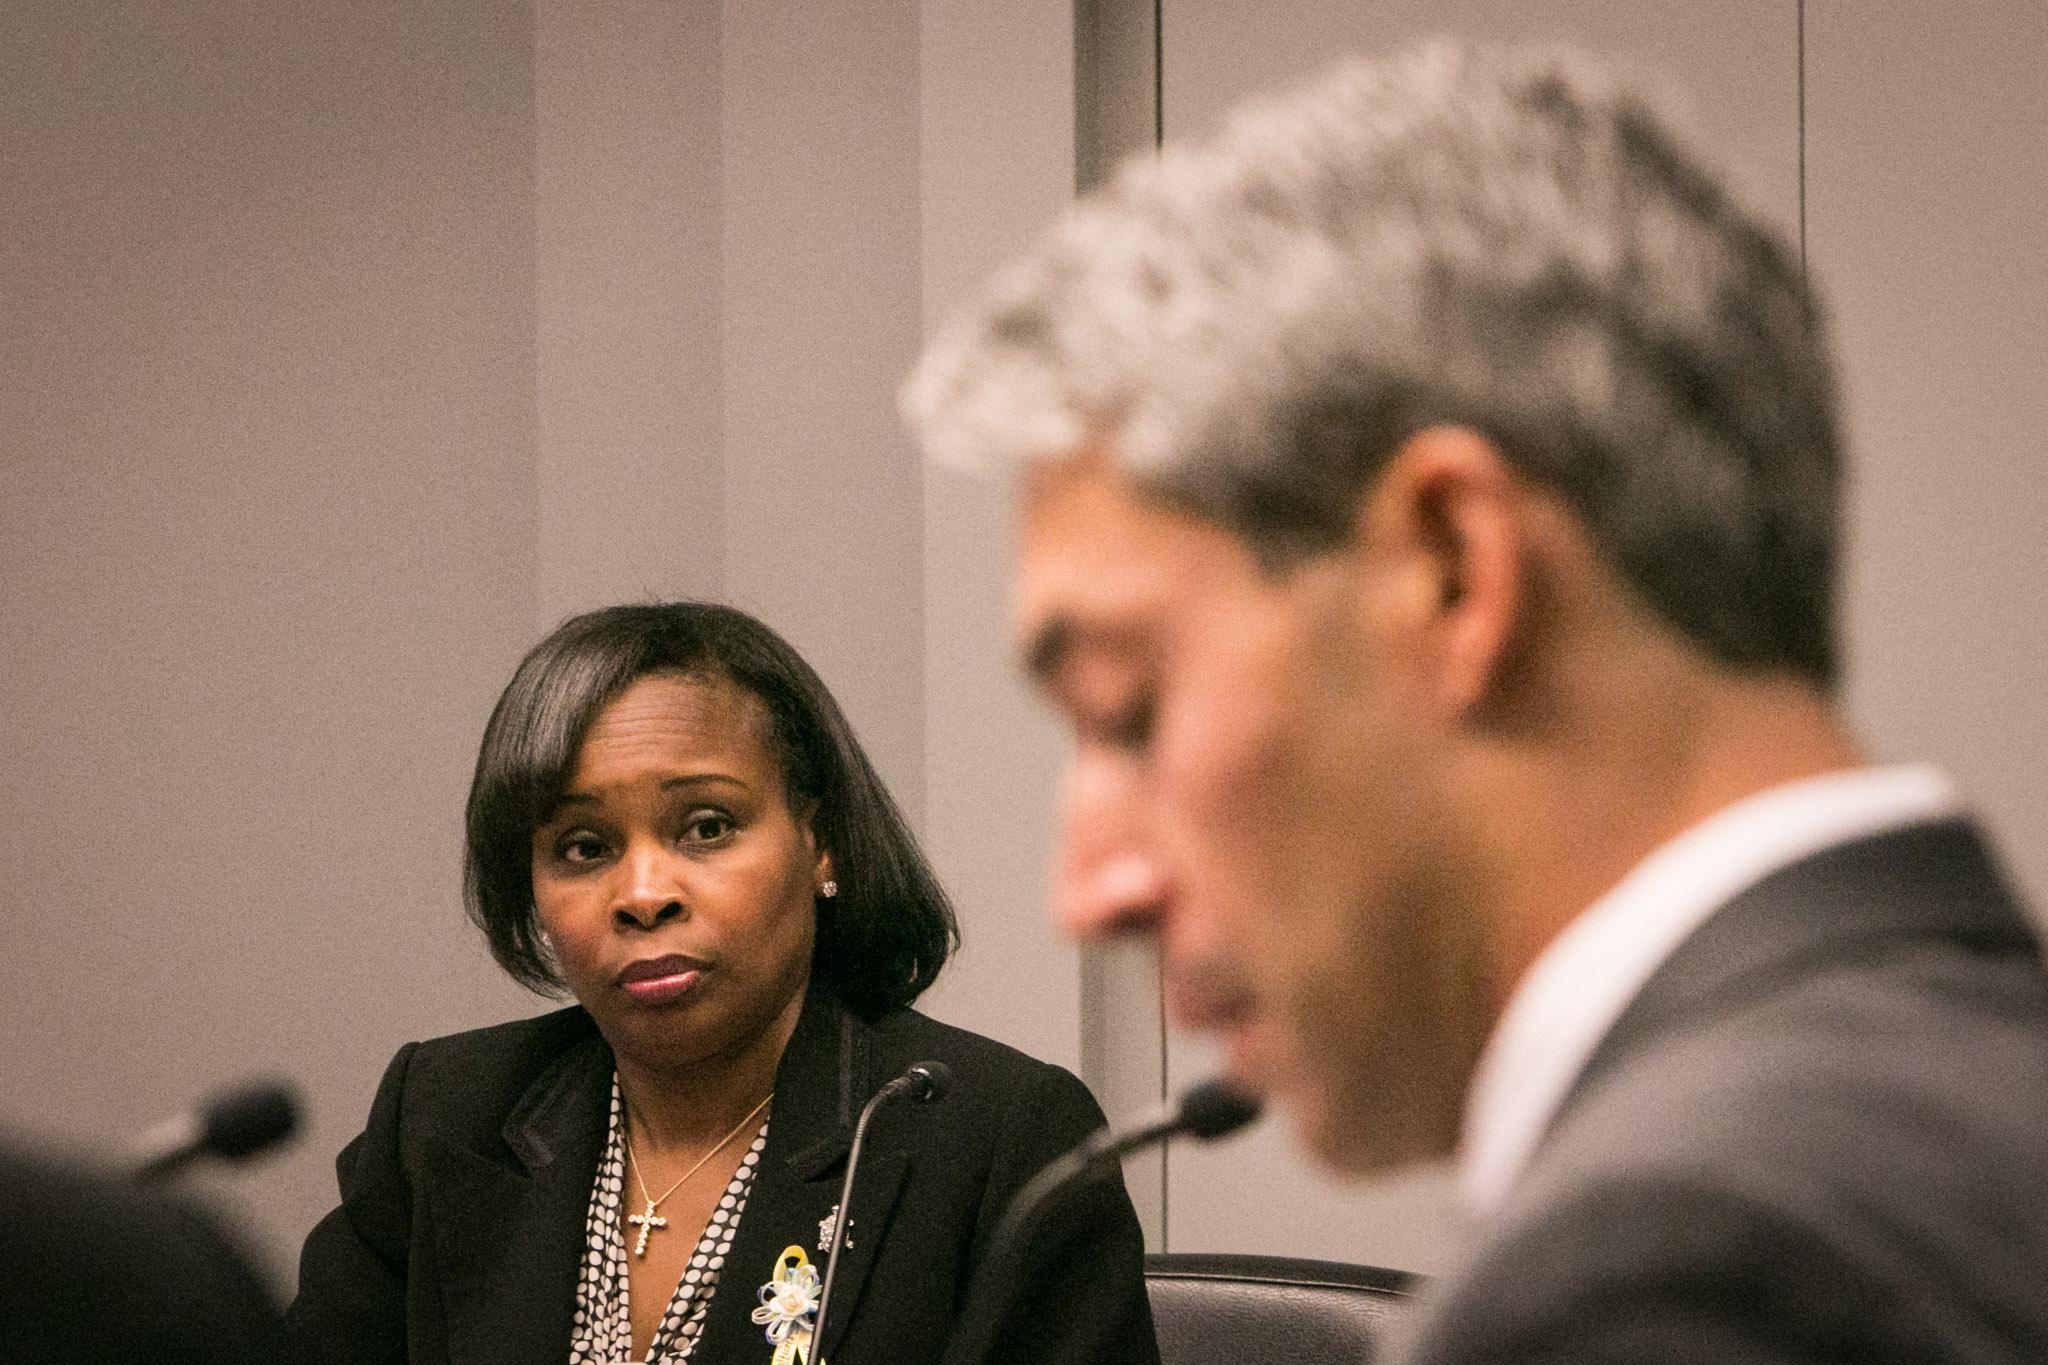 Mayor Ivy Taylor (left) glances at Councilman Ron Nirenberg (D8) during City Council B Session at Municipal Plaza Building.